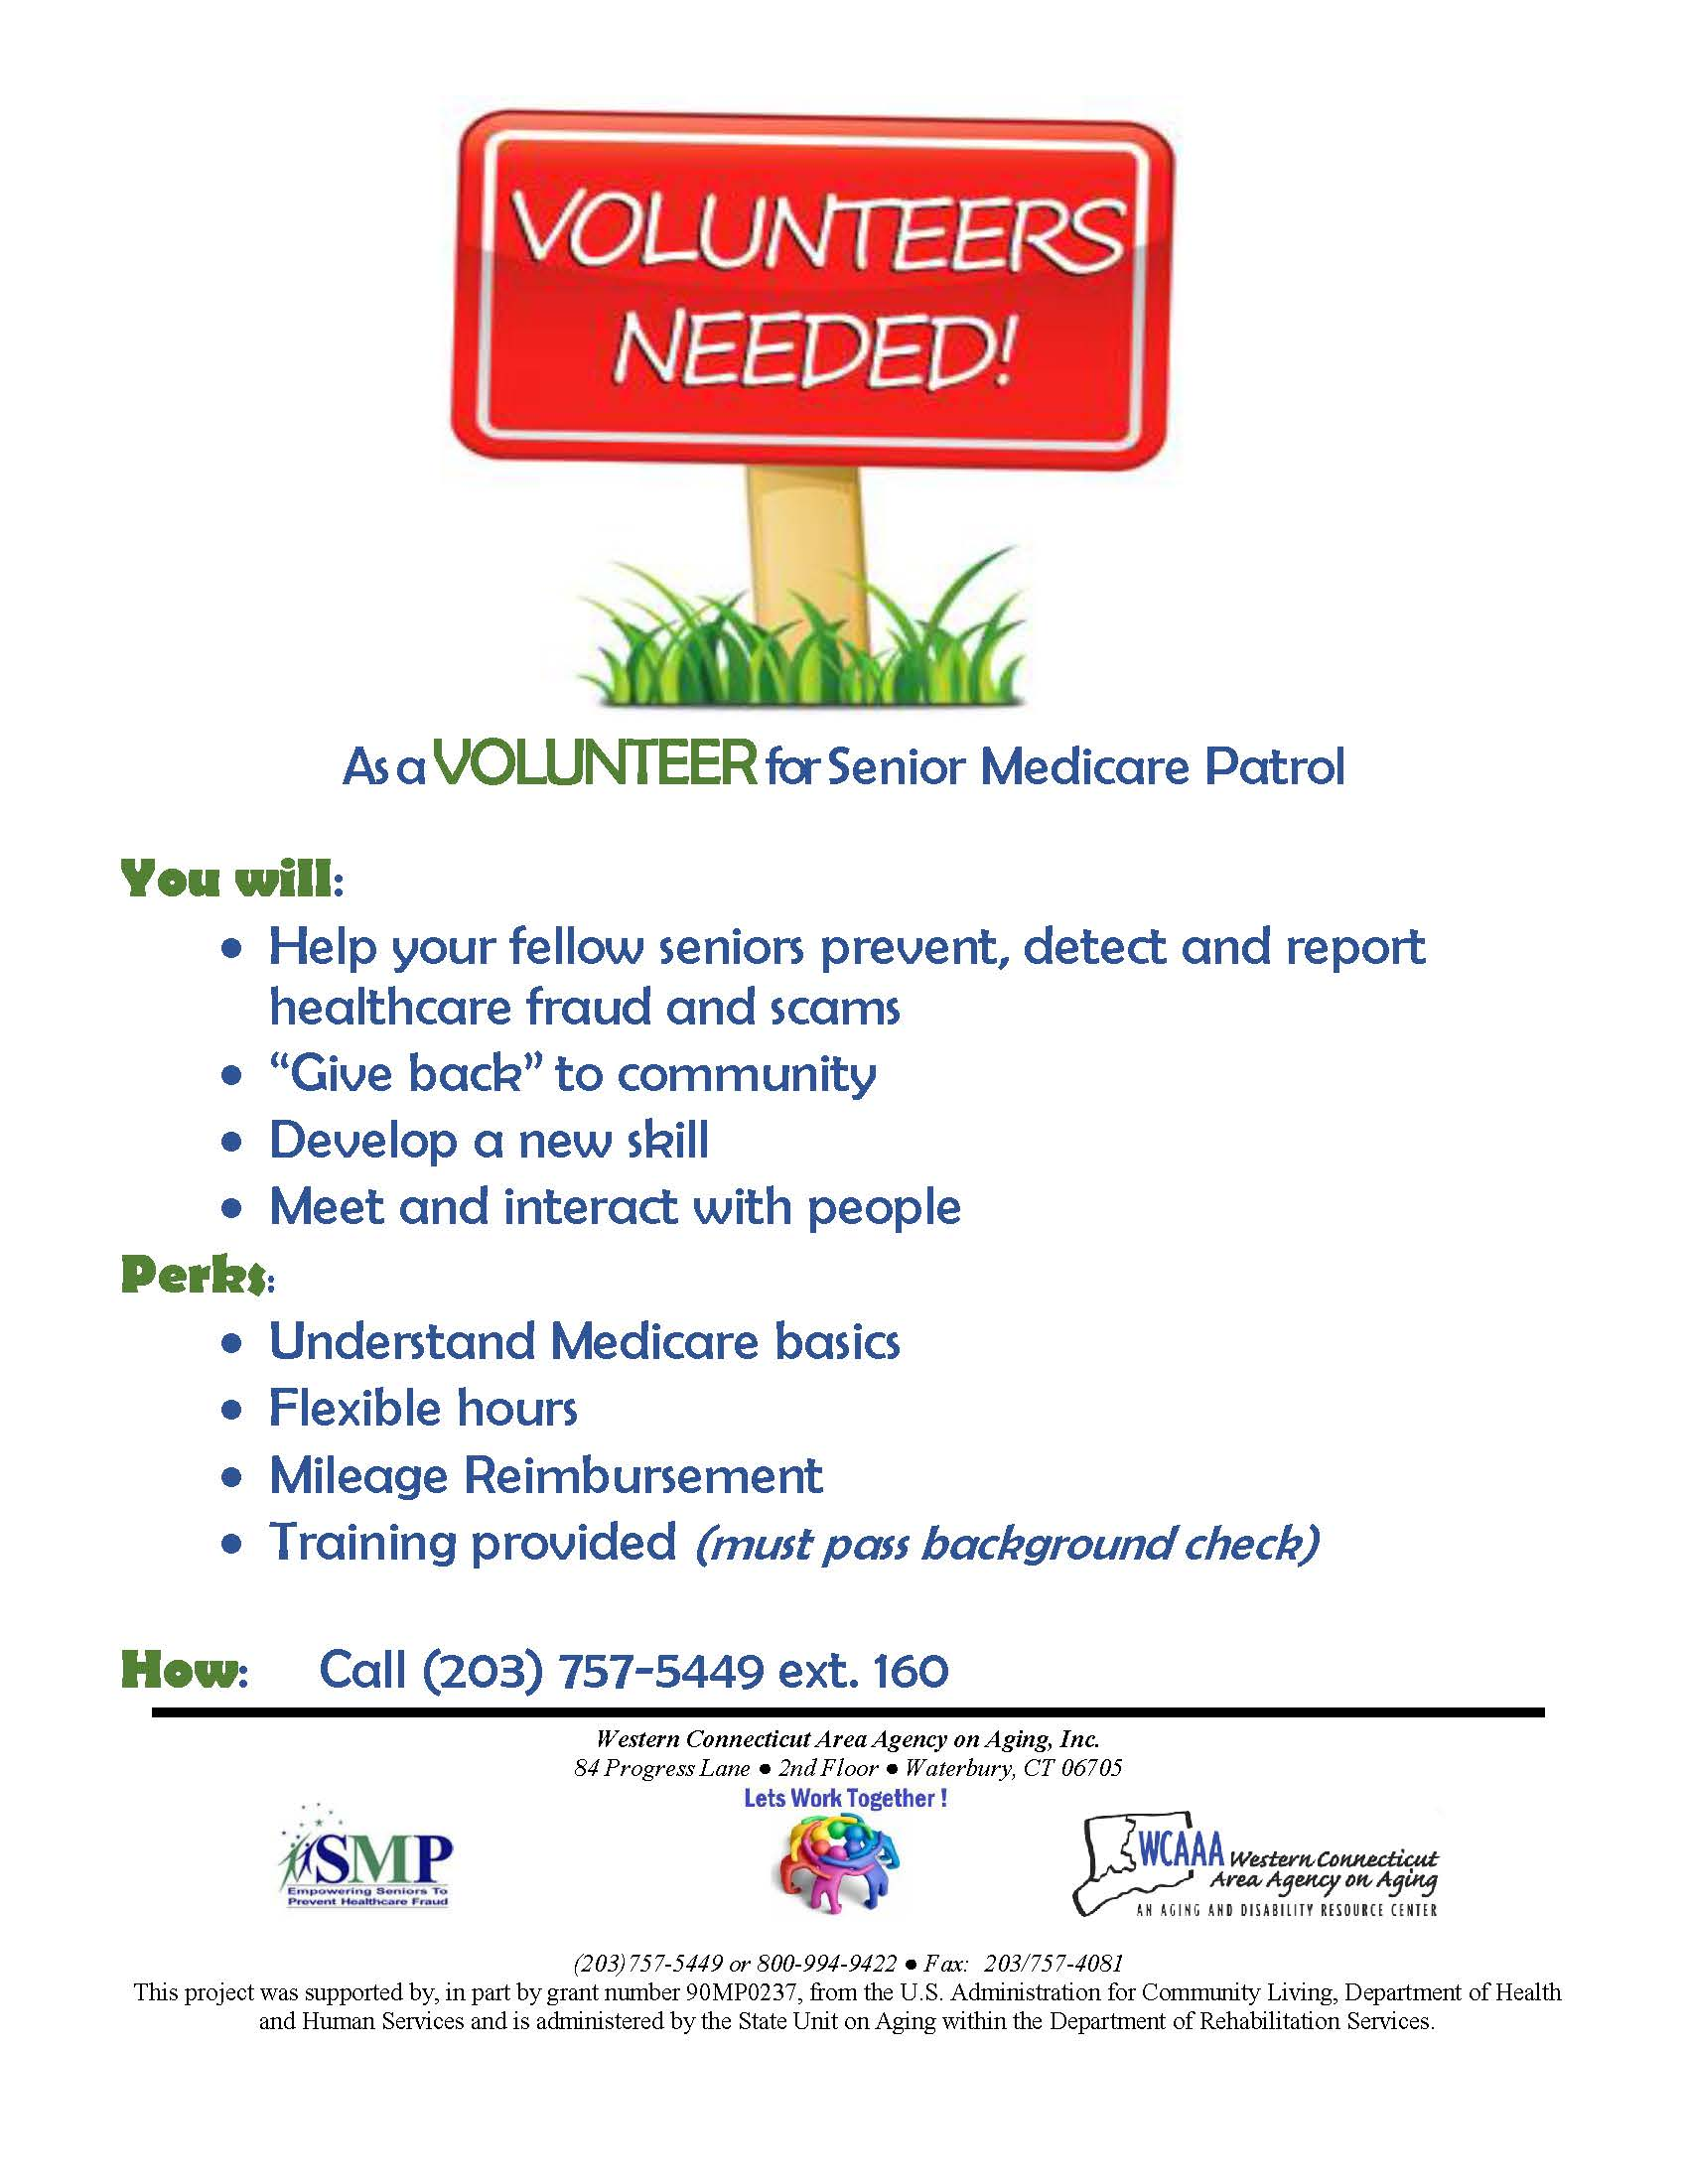 senior medicare patrol (smp) | western connecticut area agency on aging